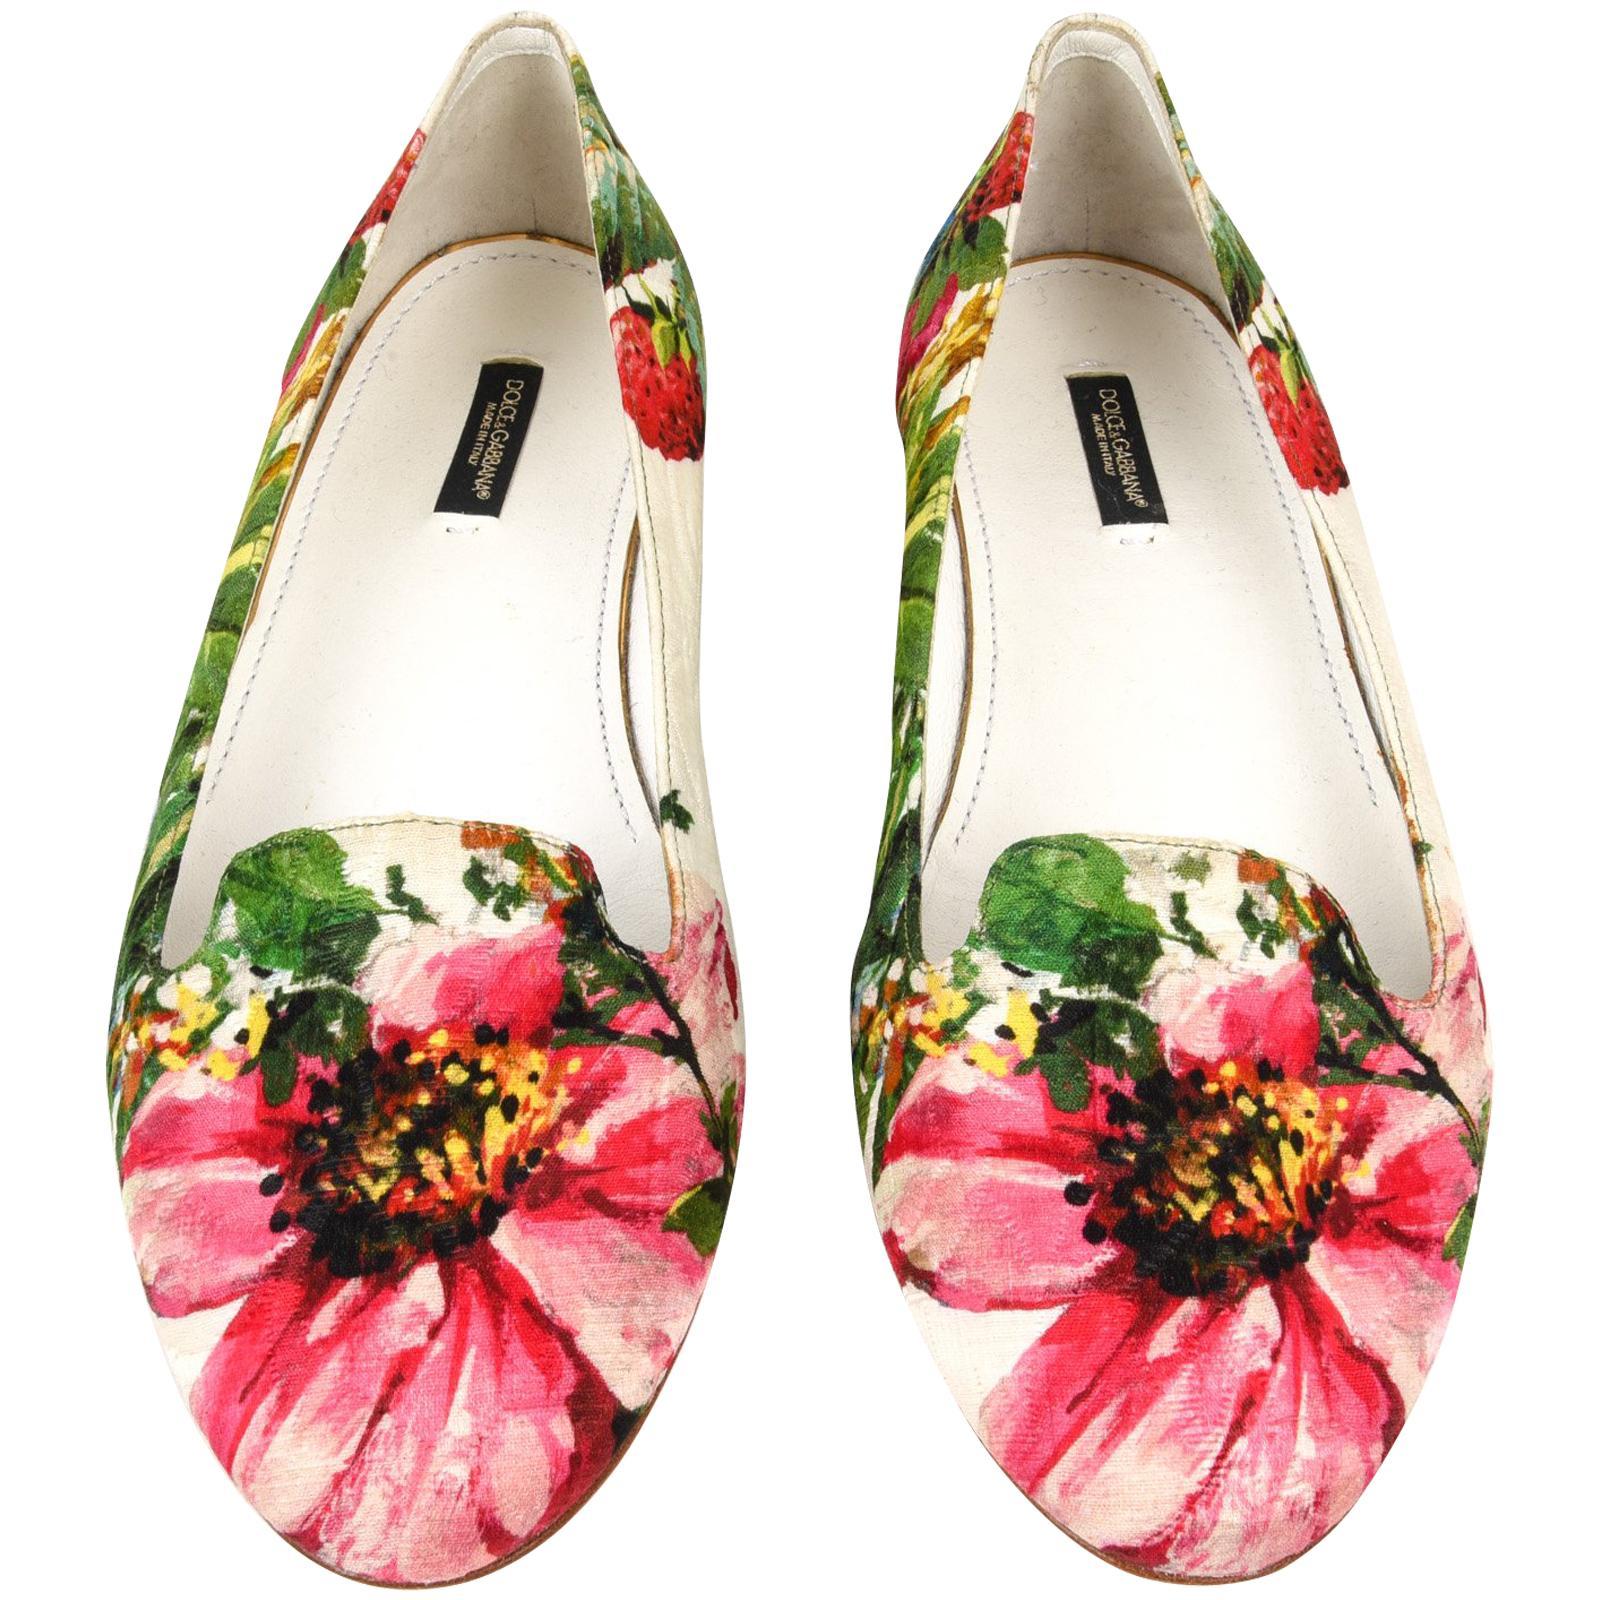 Dolce&Gabbana Exotic scarpe Ballet Flat Exotic Dolce&Gabbana Flower Print Brocade Textile   aaa79c